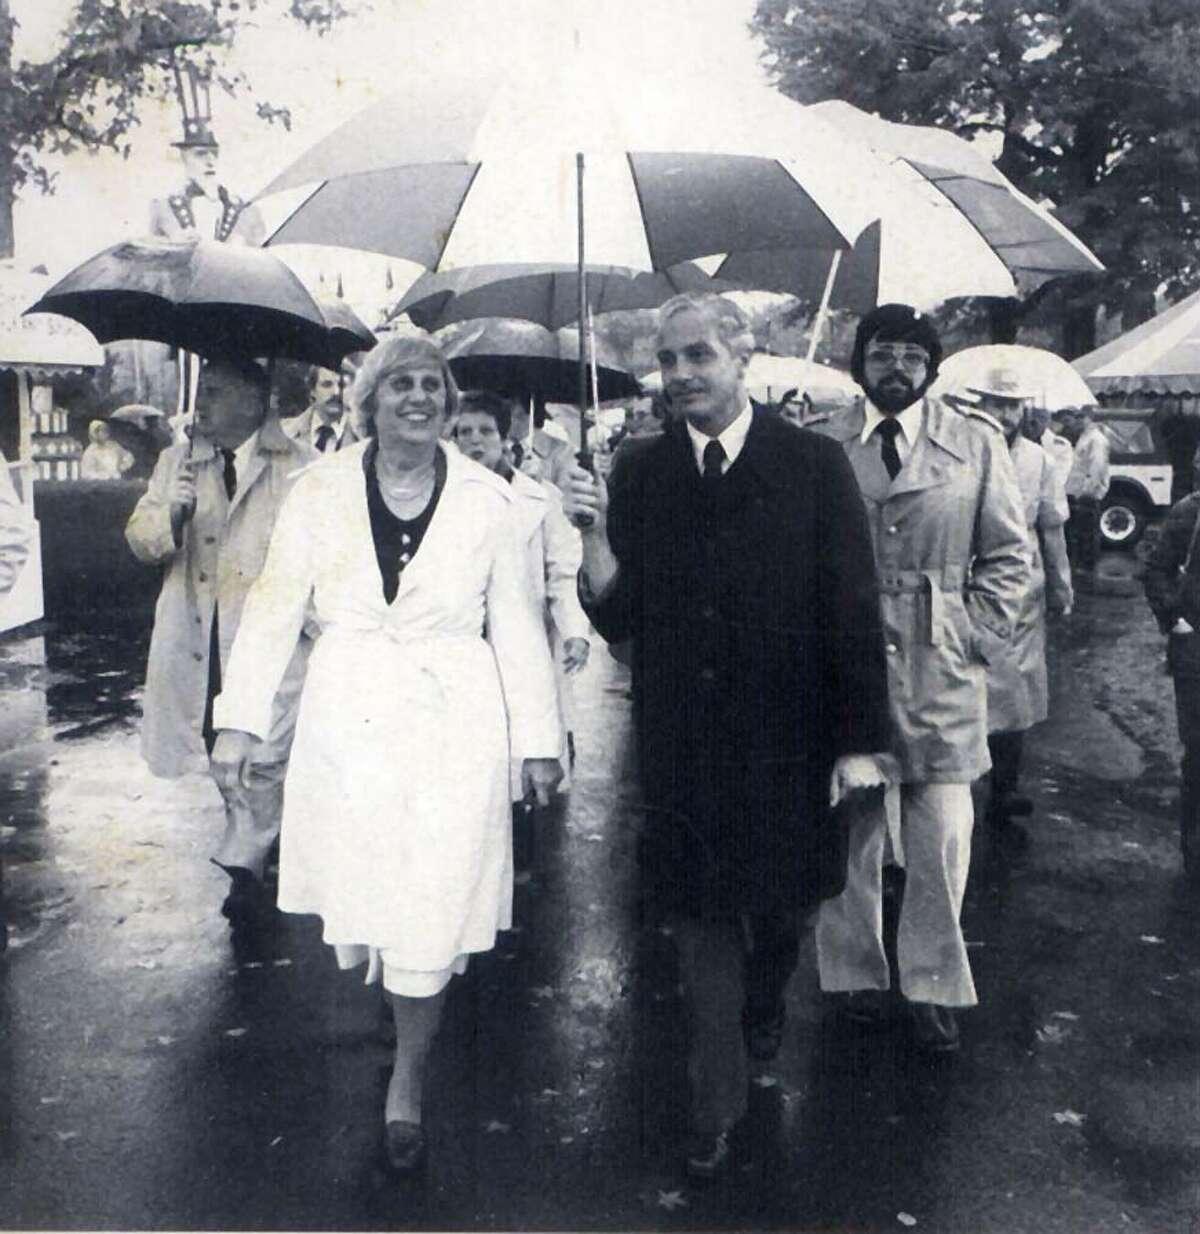 Gov. Ella Grasso tours the Danbury Fair with Congressman Bill Ratchford in this undated photo.